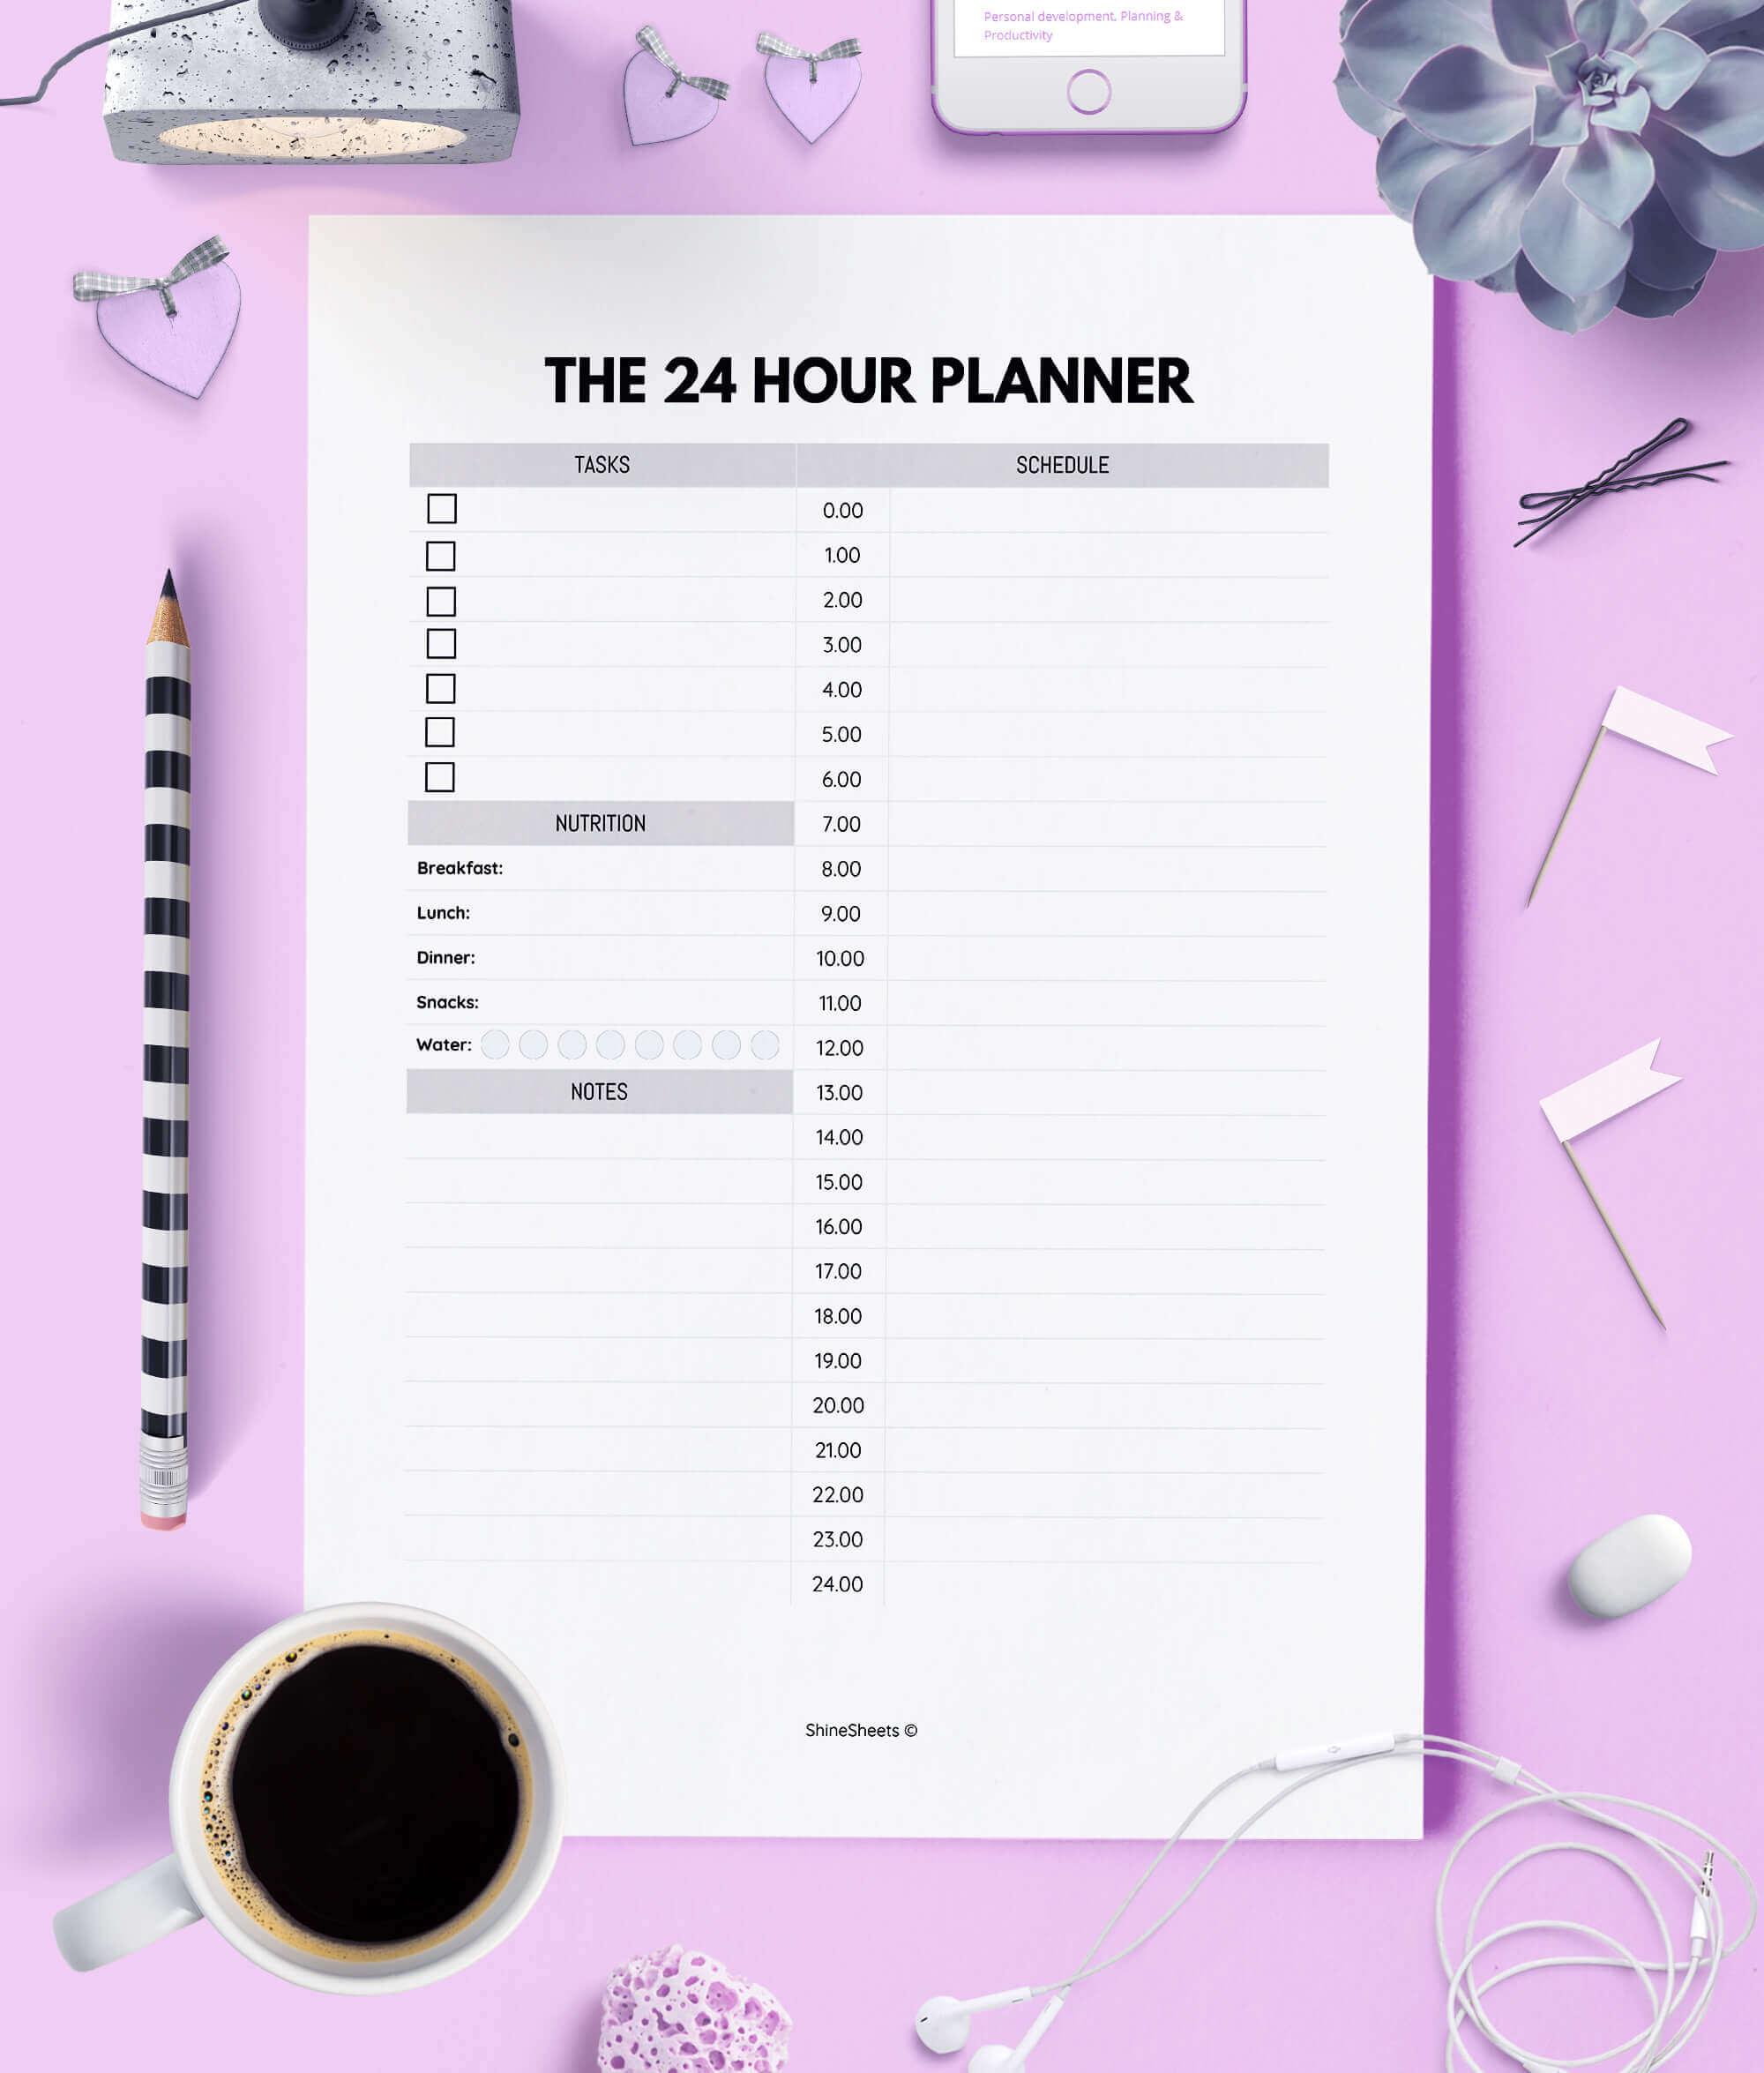 24 Hour Daily Planner Printable regarding 24 Hour Daily Planner Printable